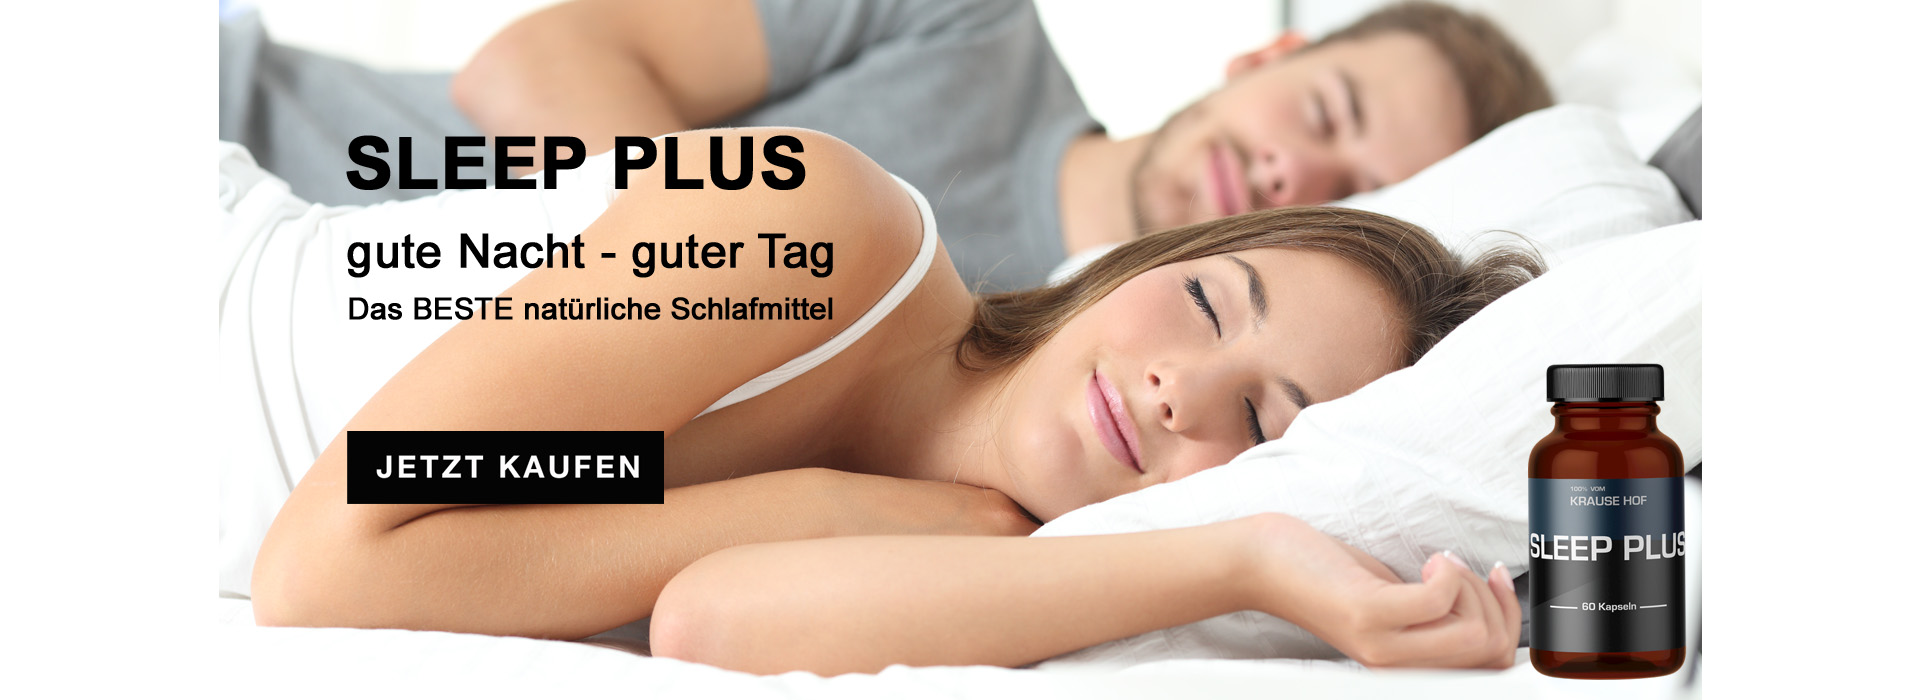 Sleep Plus Banner